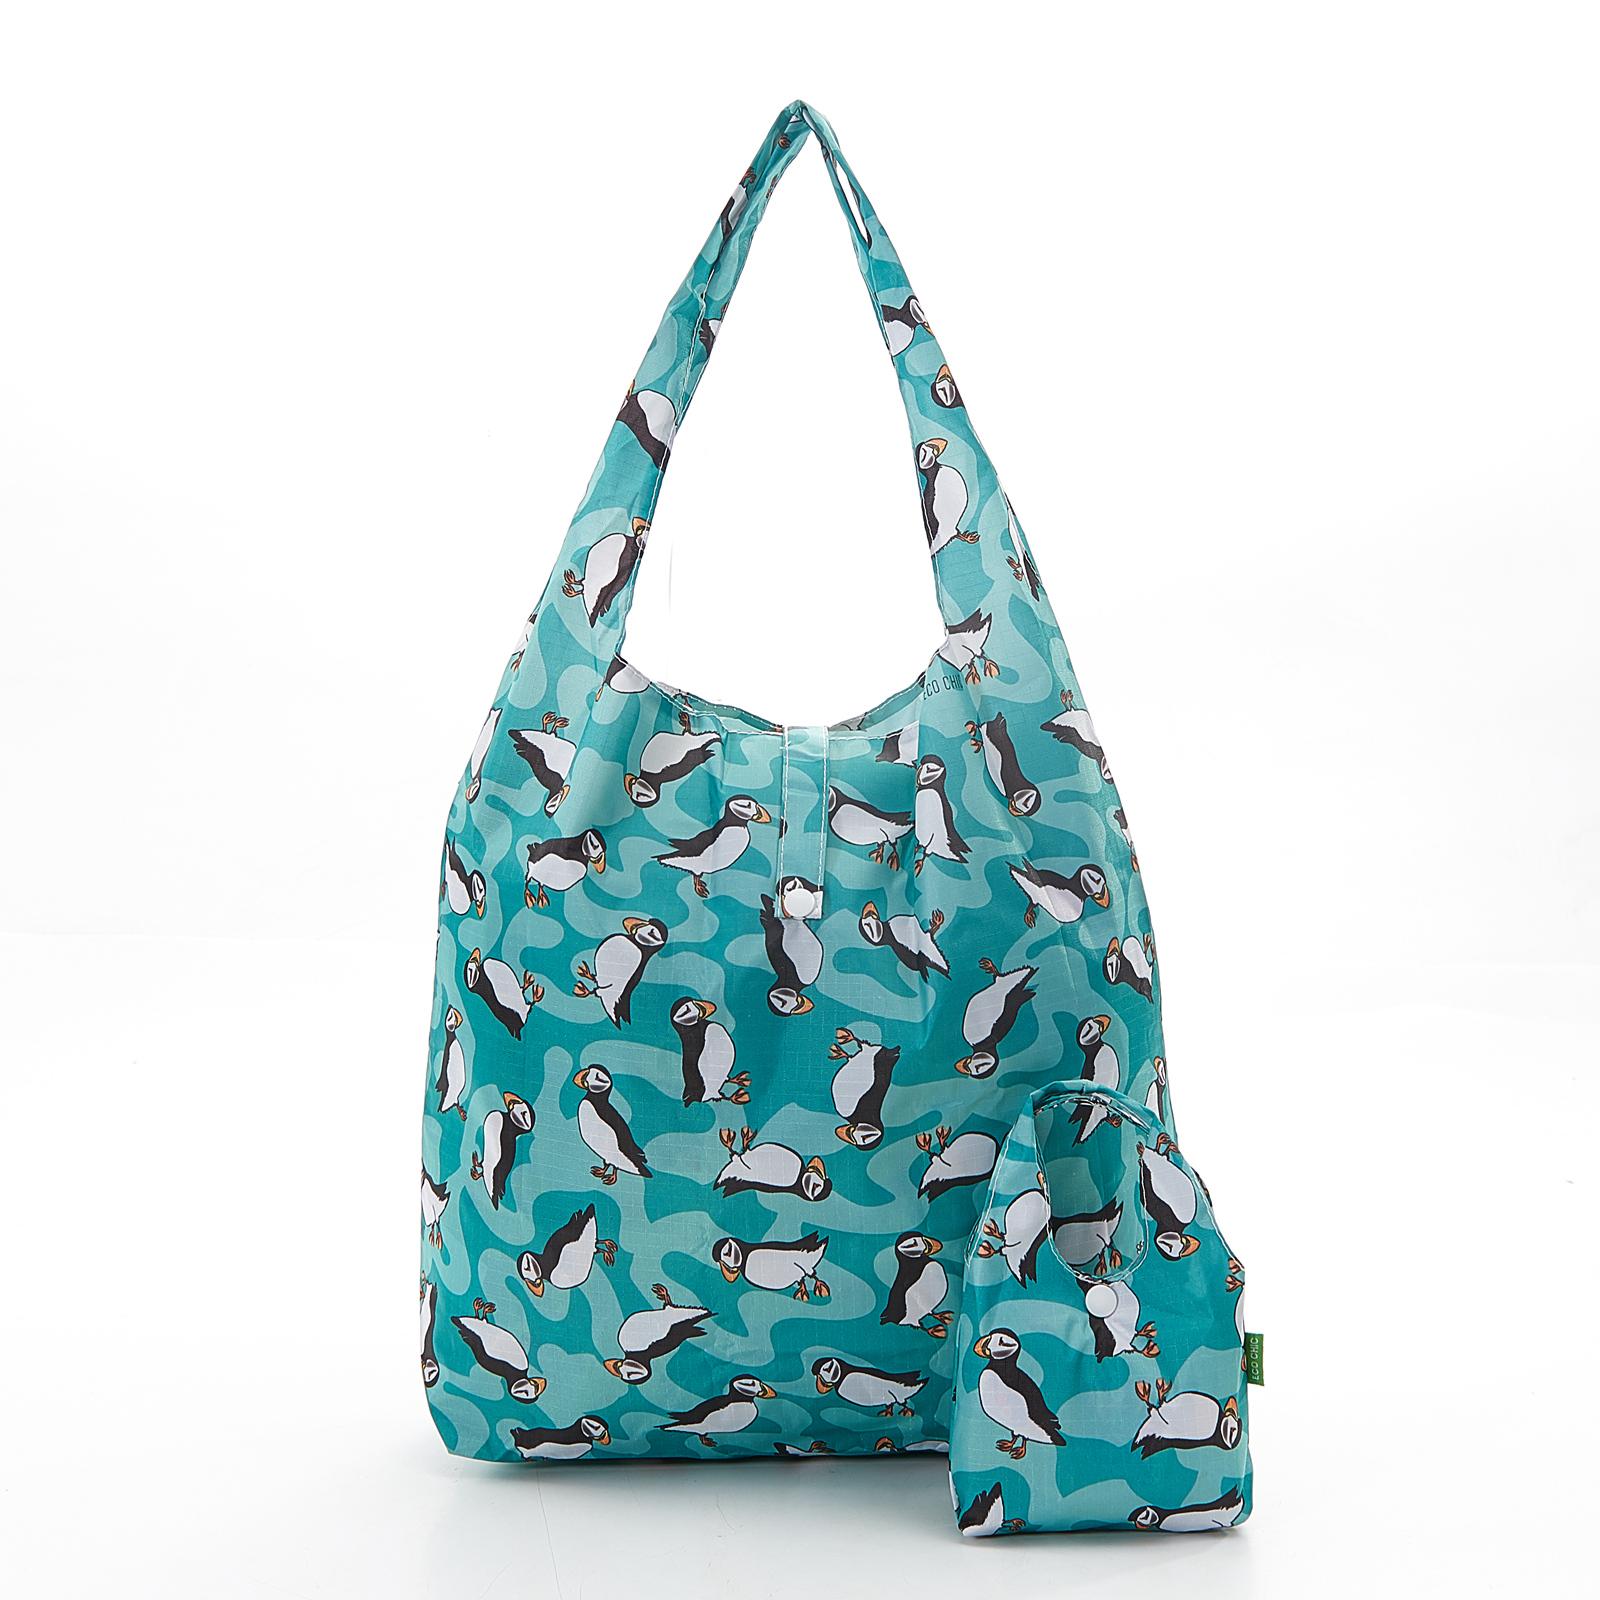 Foldaway shopping bag, puffins